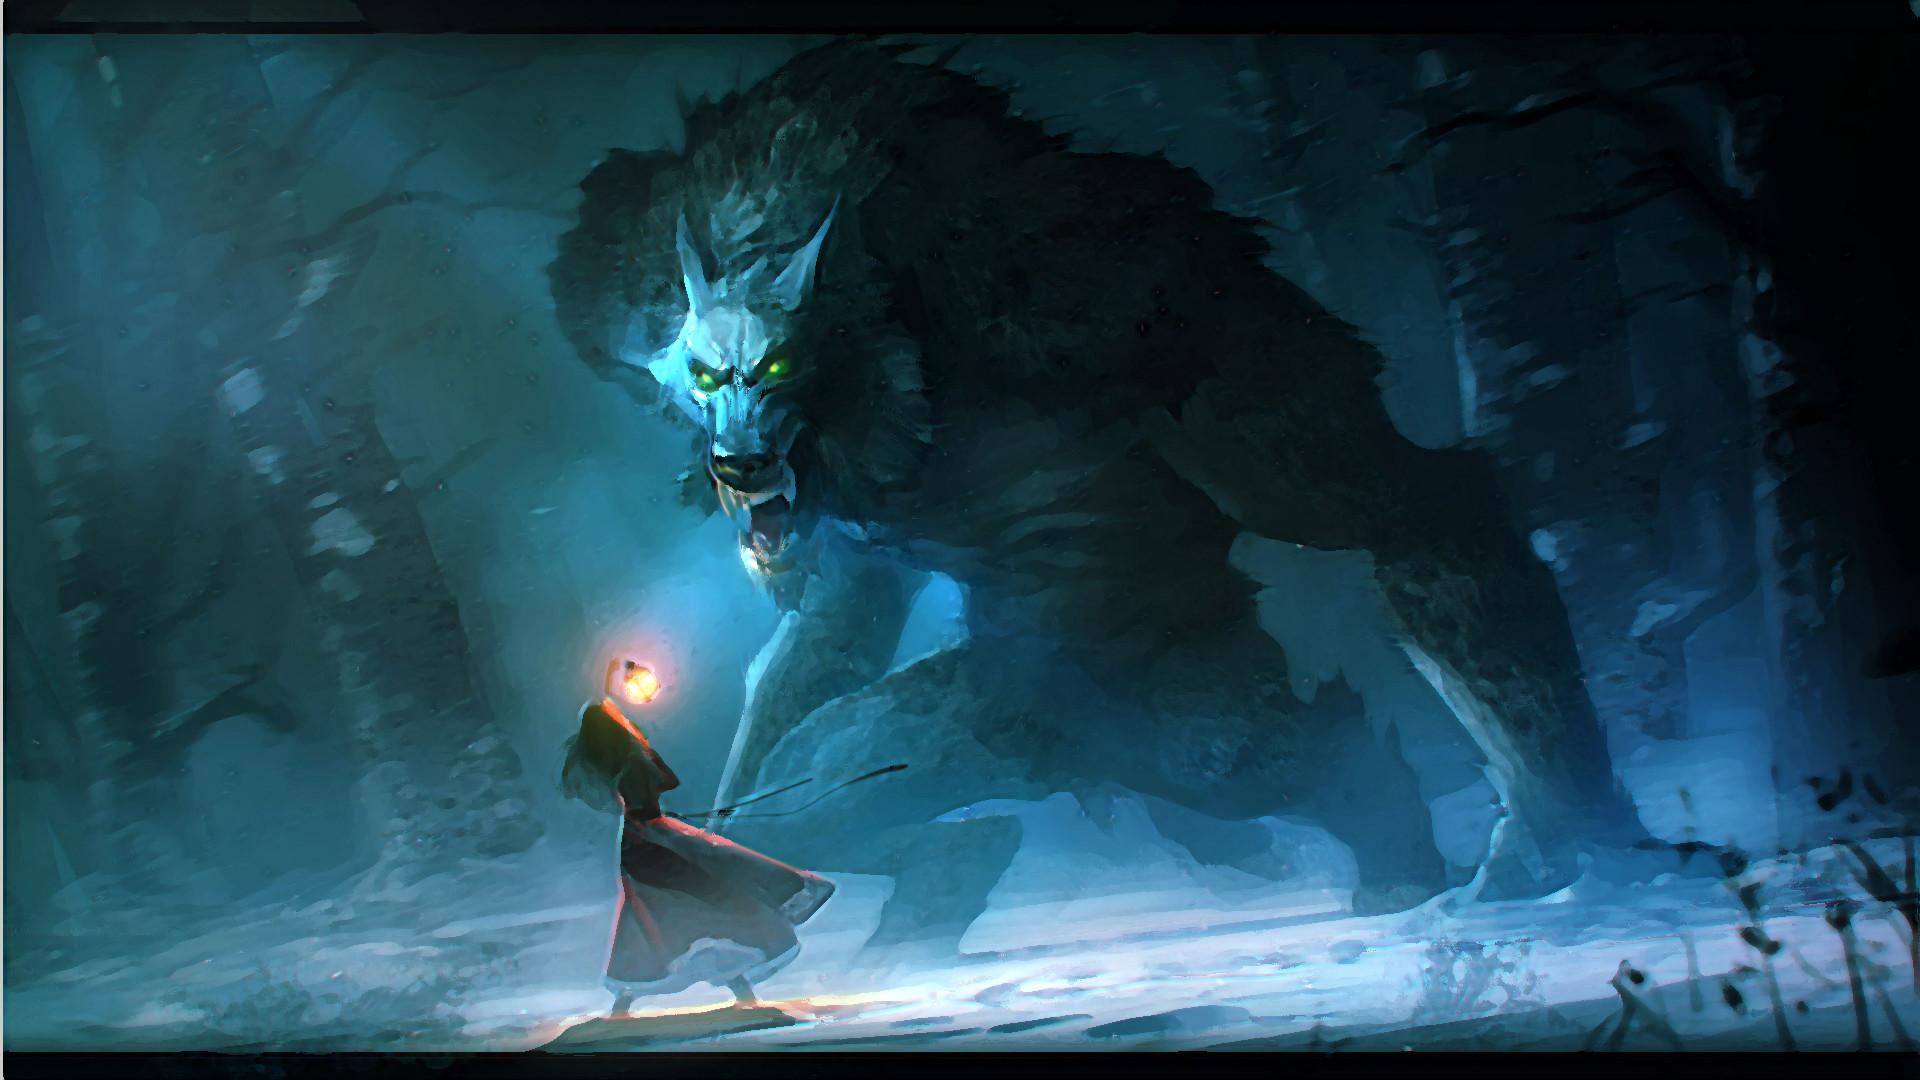 Werewolf Full HD wallpaper by Niconoff deviantart | Full HD Wallpapers .